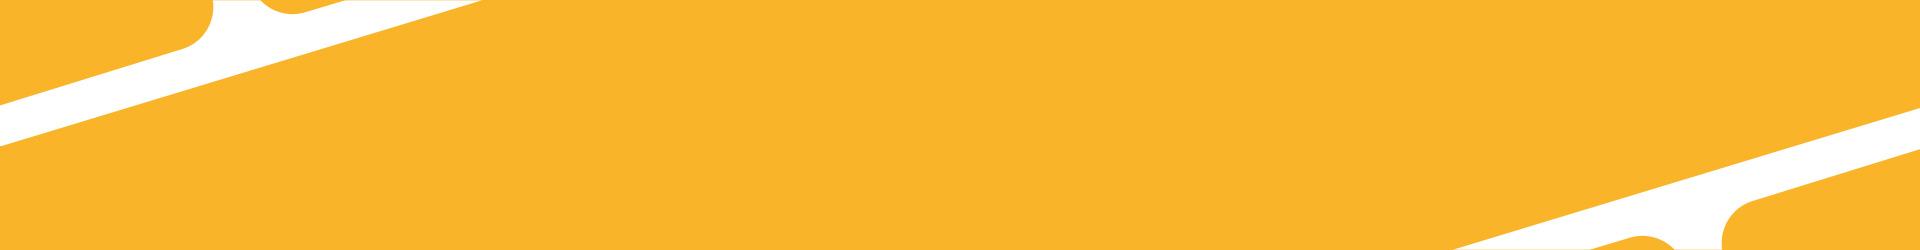 Footer-Web-Belda-Llorens-1920x250